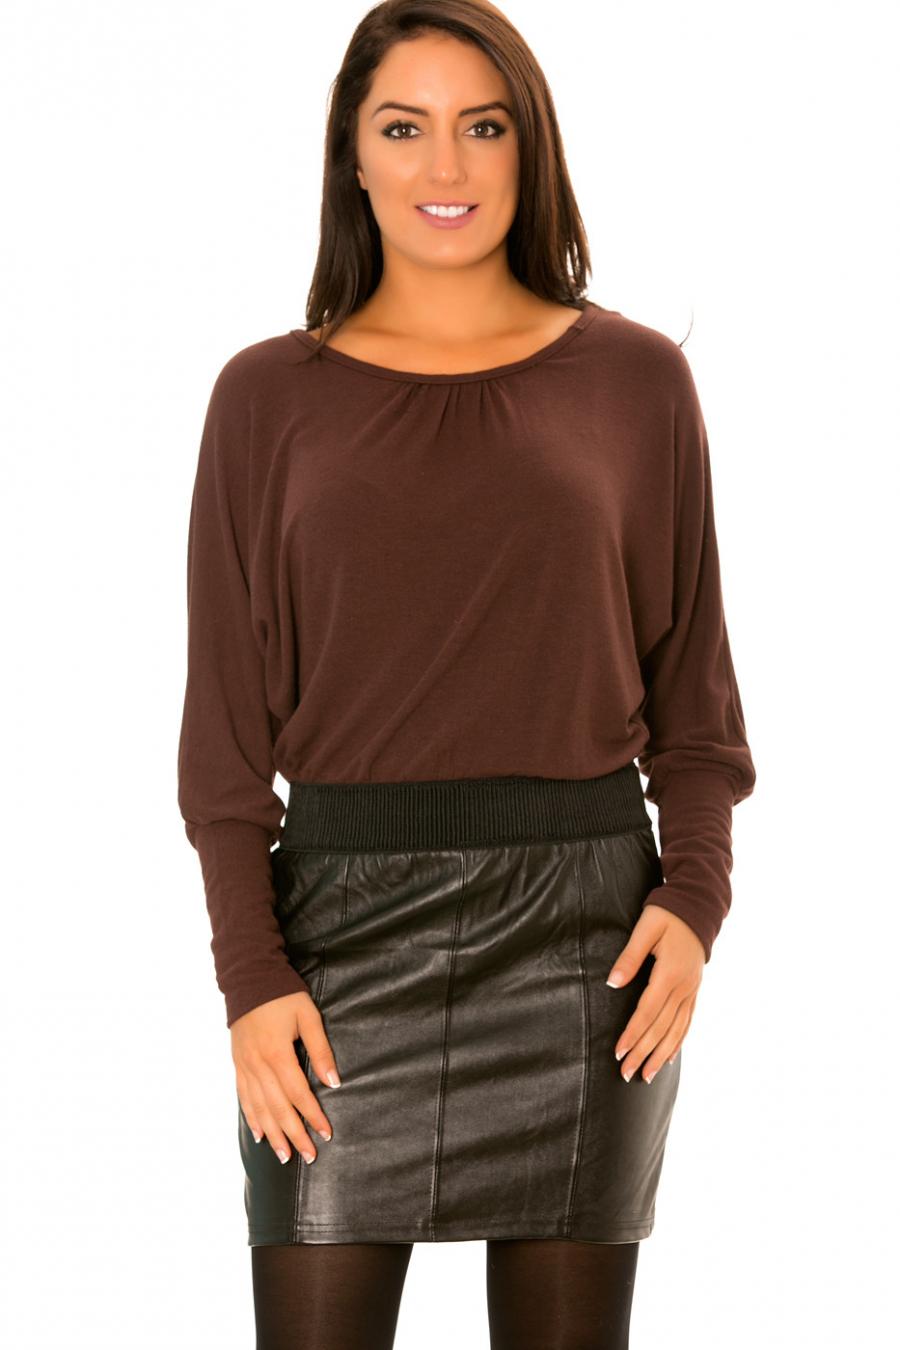 Robe Chocolat Bi-matière haut ample et jupe simili cuir - 158